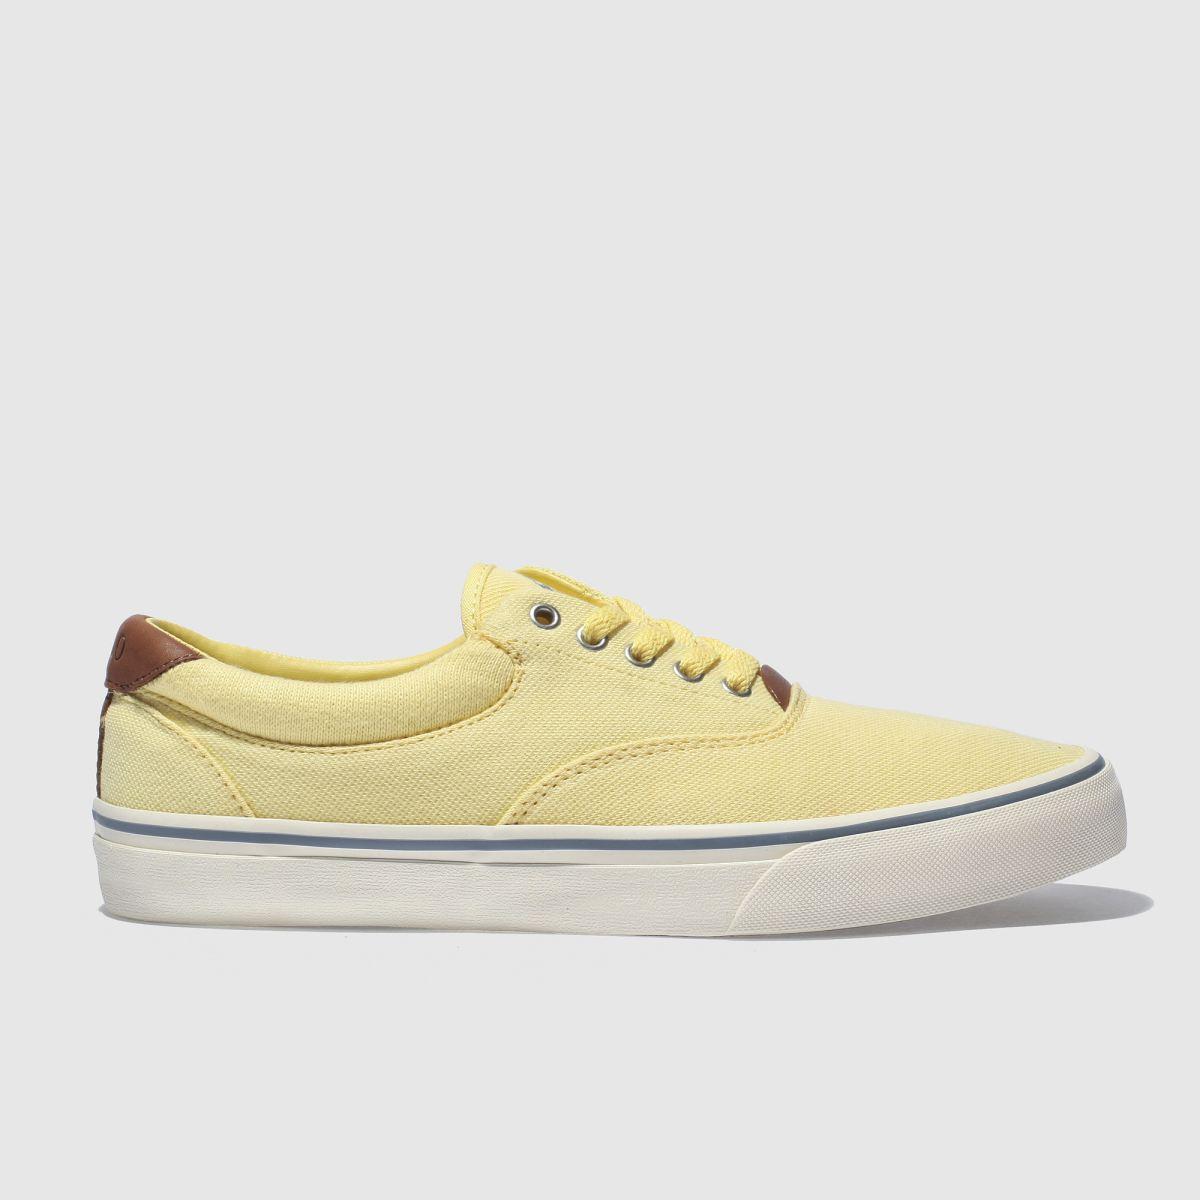 Polo Ralph Lauren Yellow Thorton Ii Shoes